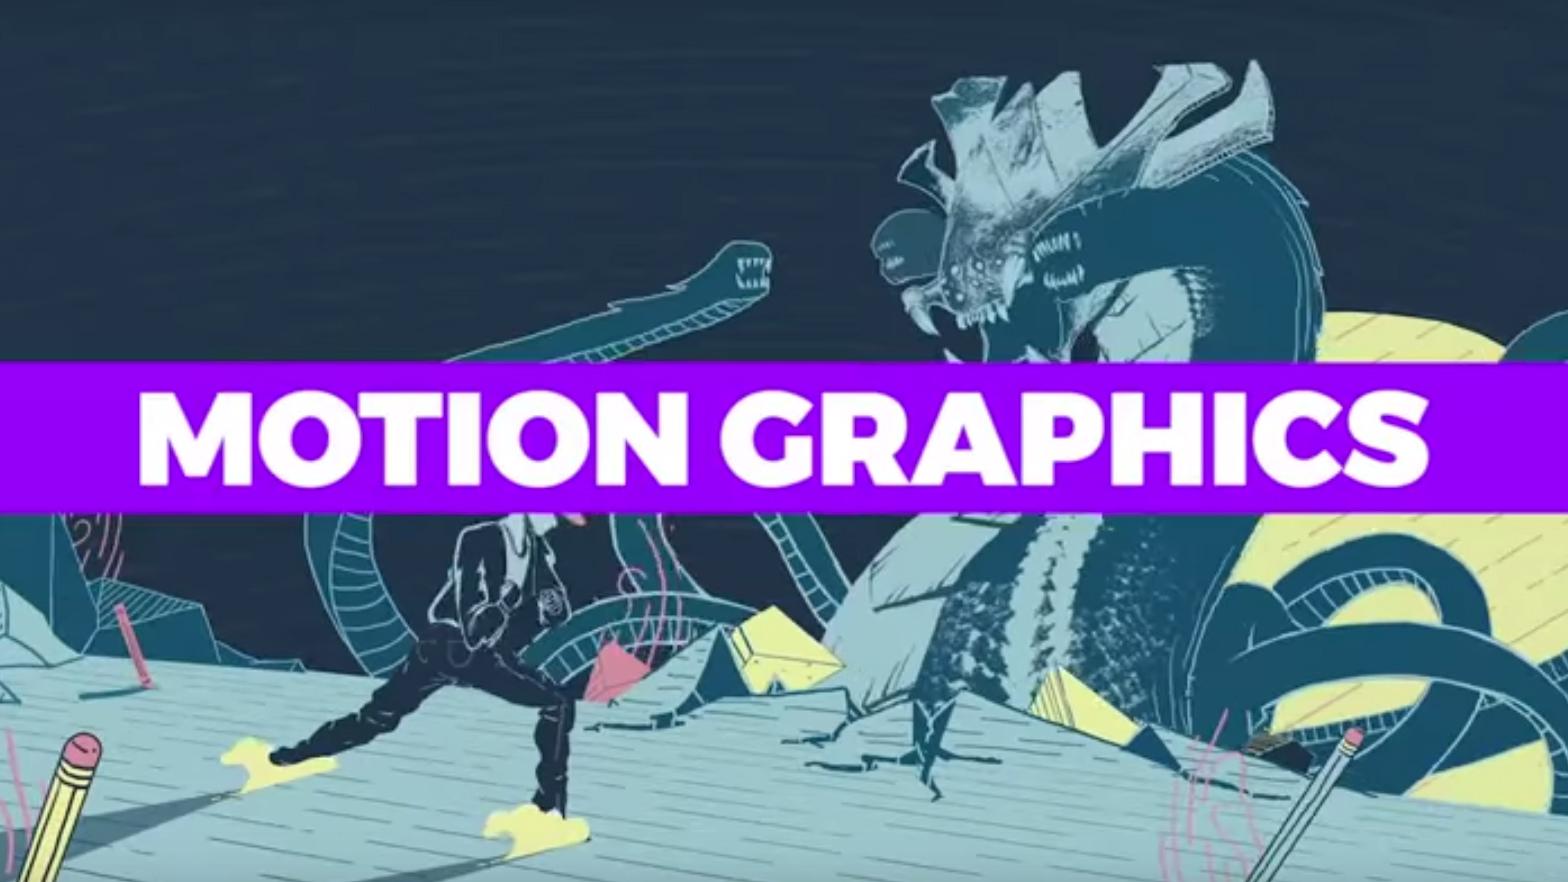 موشن گرافیک چیست و چگونه موشن گرافی بسازیم؟